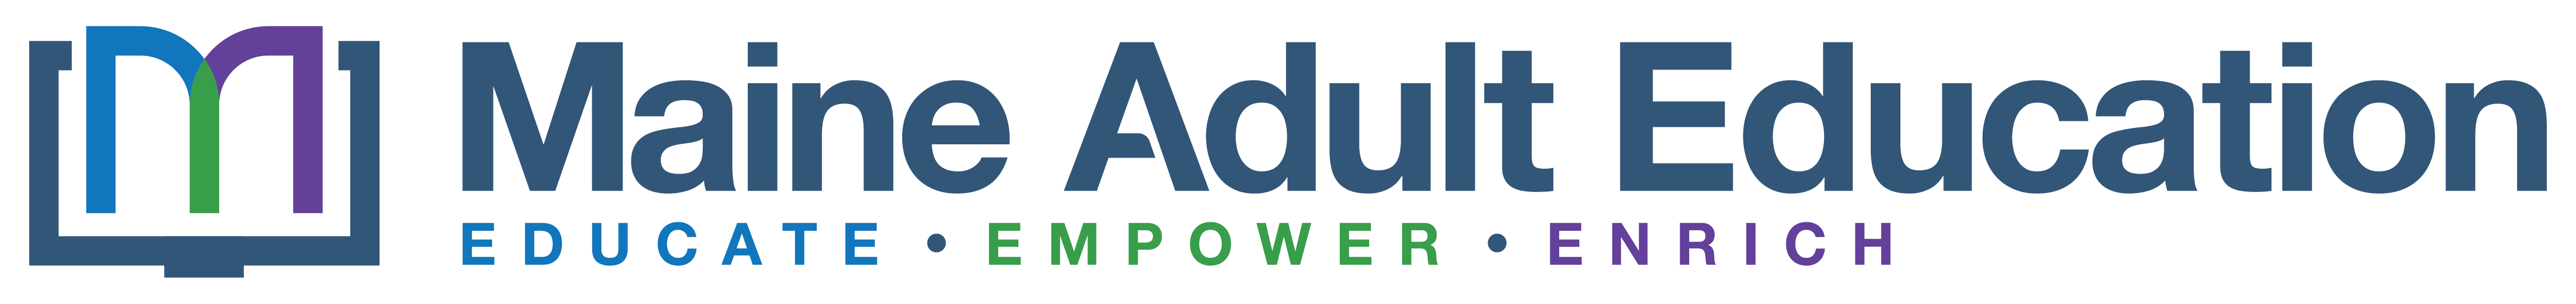 Maine Adult Education Association